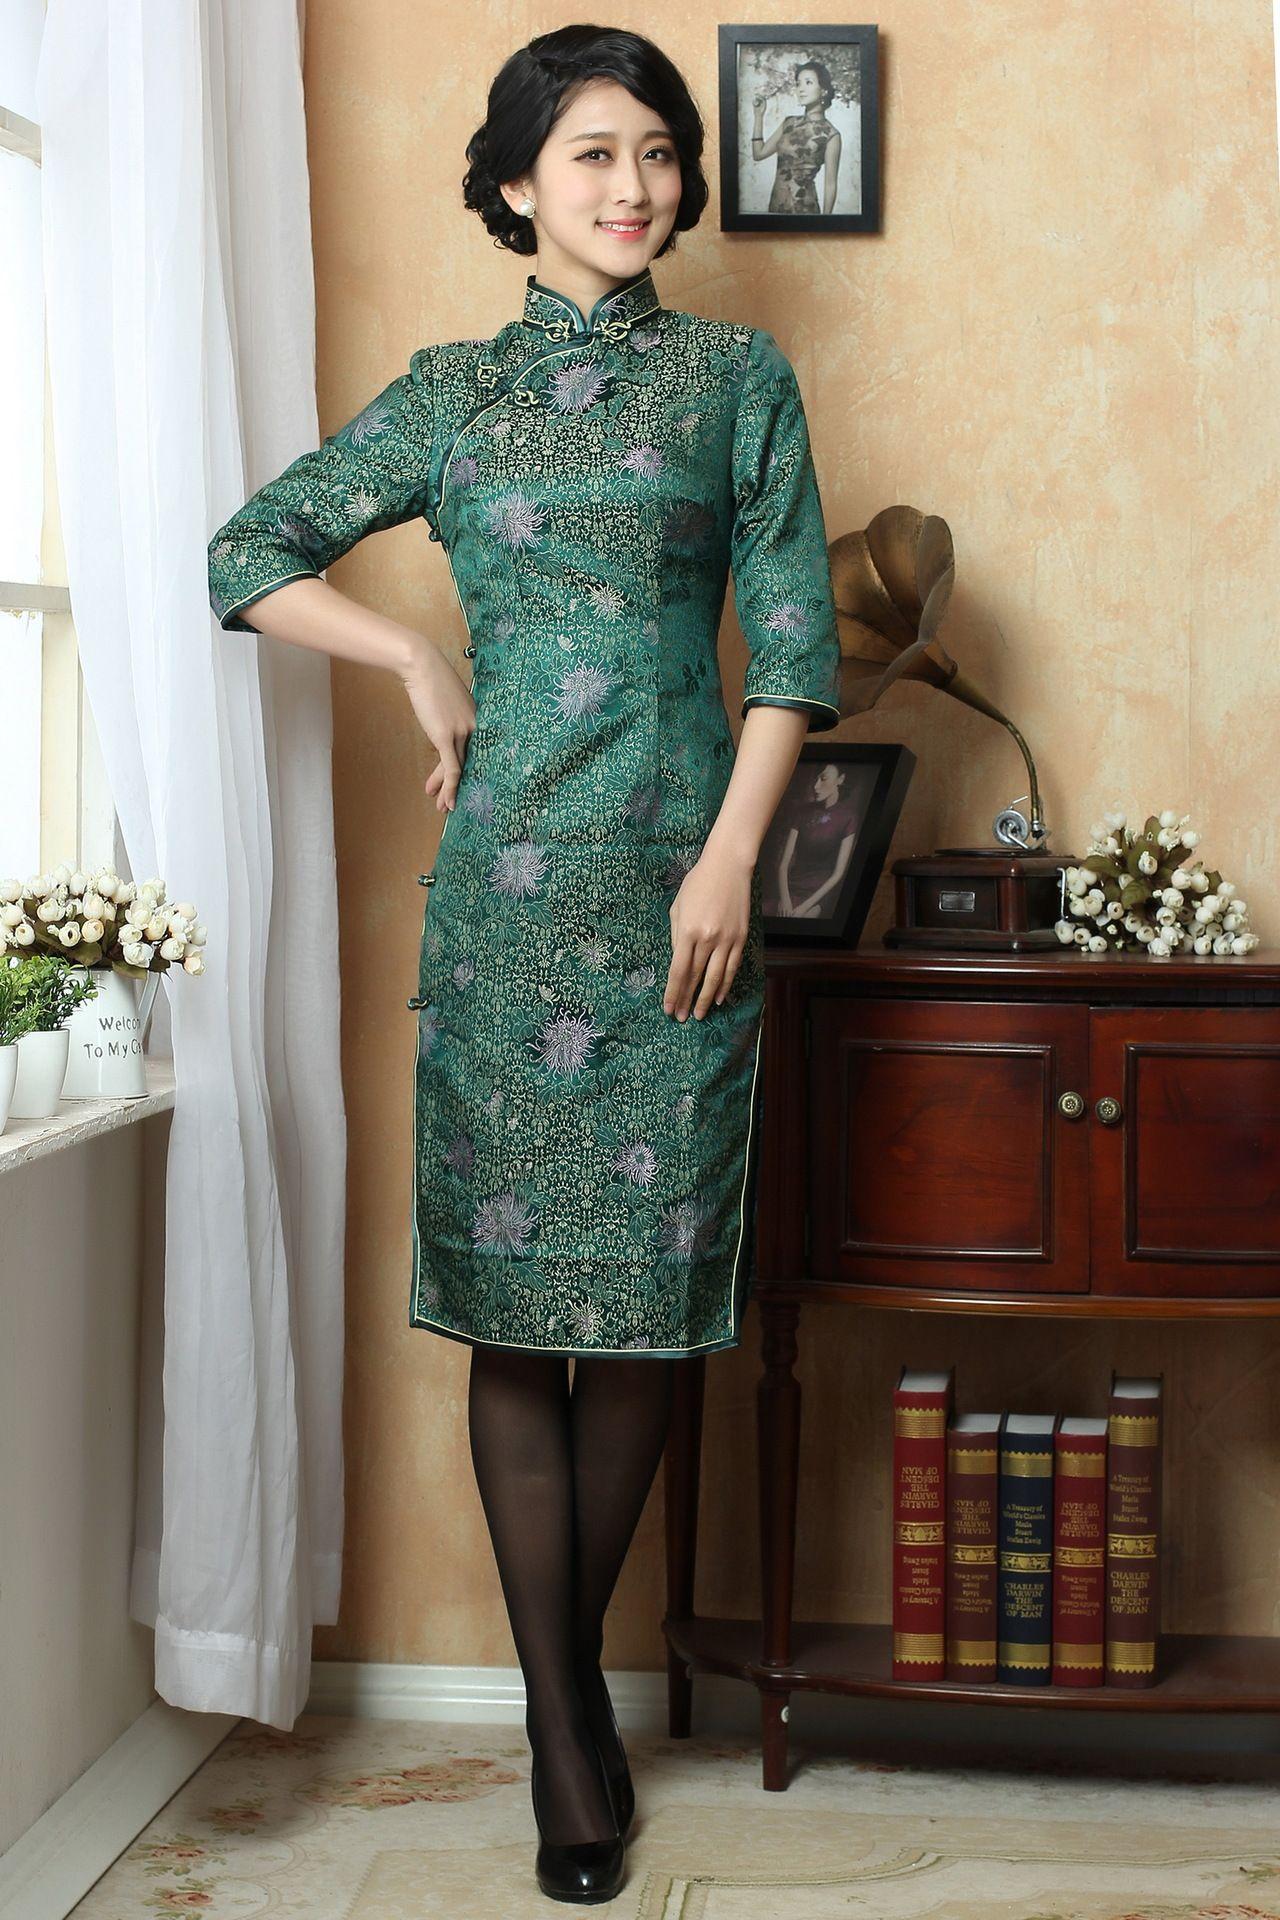 Green Egeria Chrysanthemum Floral Traditional Silk Brocade Qipao Chinese 3 Quarter Long Sleeves Che Traditional Chinese Dress Cheongsam Dress Long Sleeve Dress [ 1920 x 1280 Pixel ]